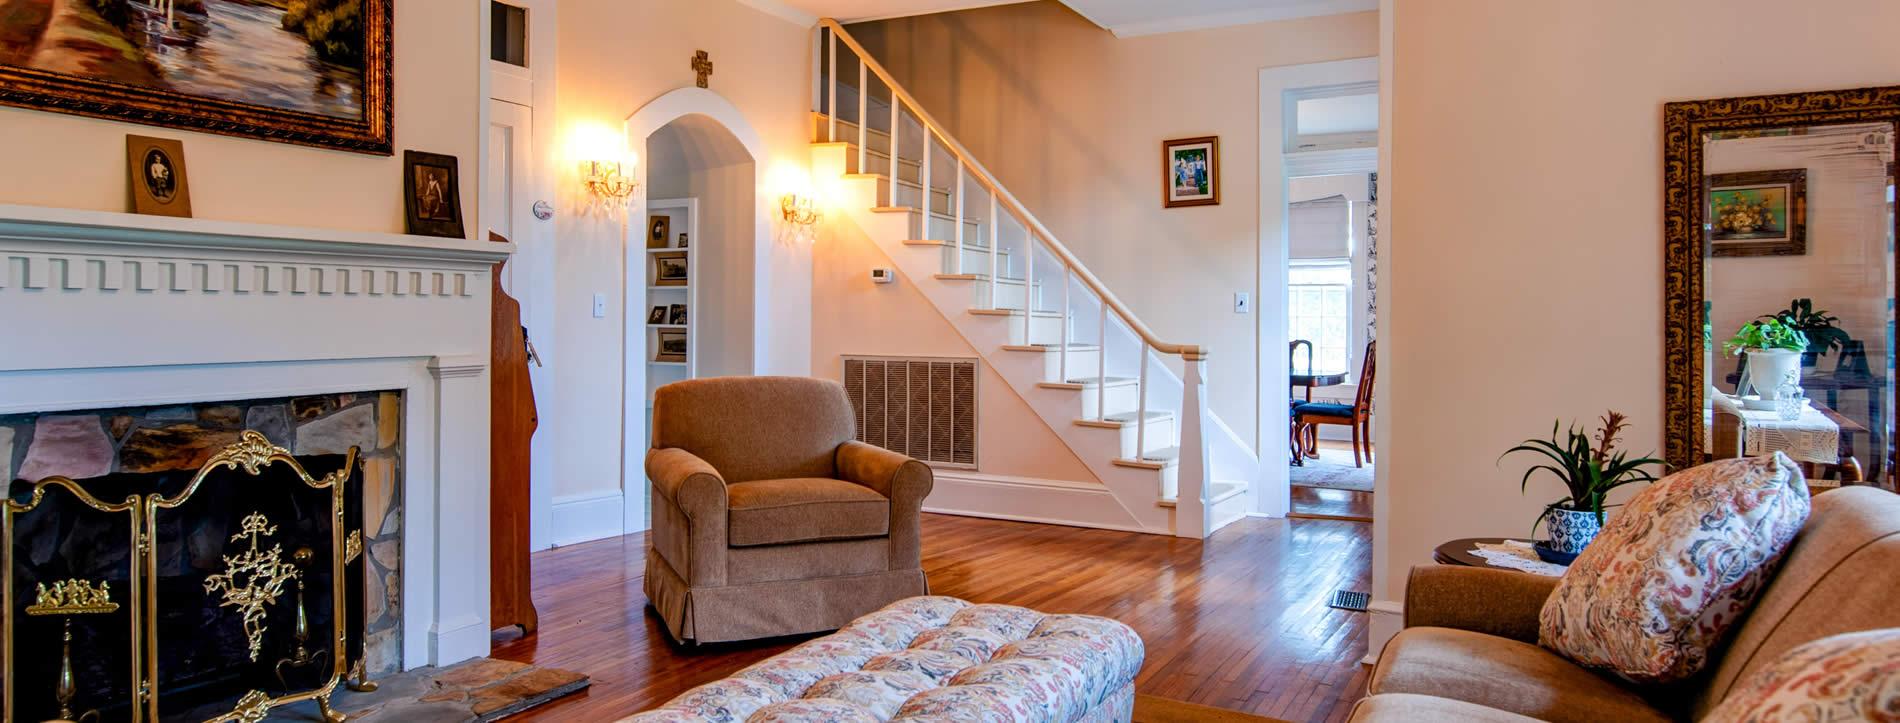 lynchburg TN bed and breakfast - livingroom